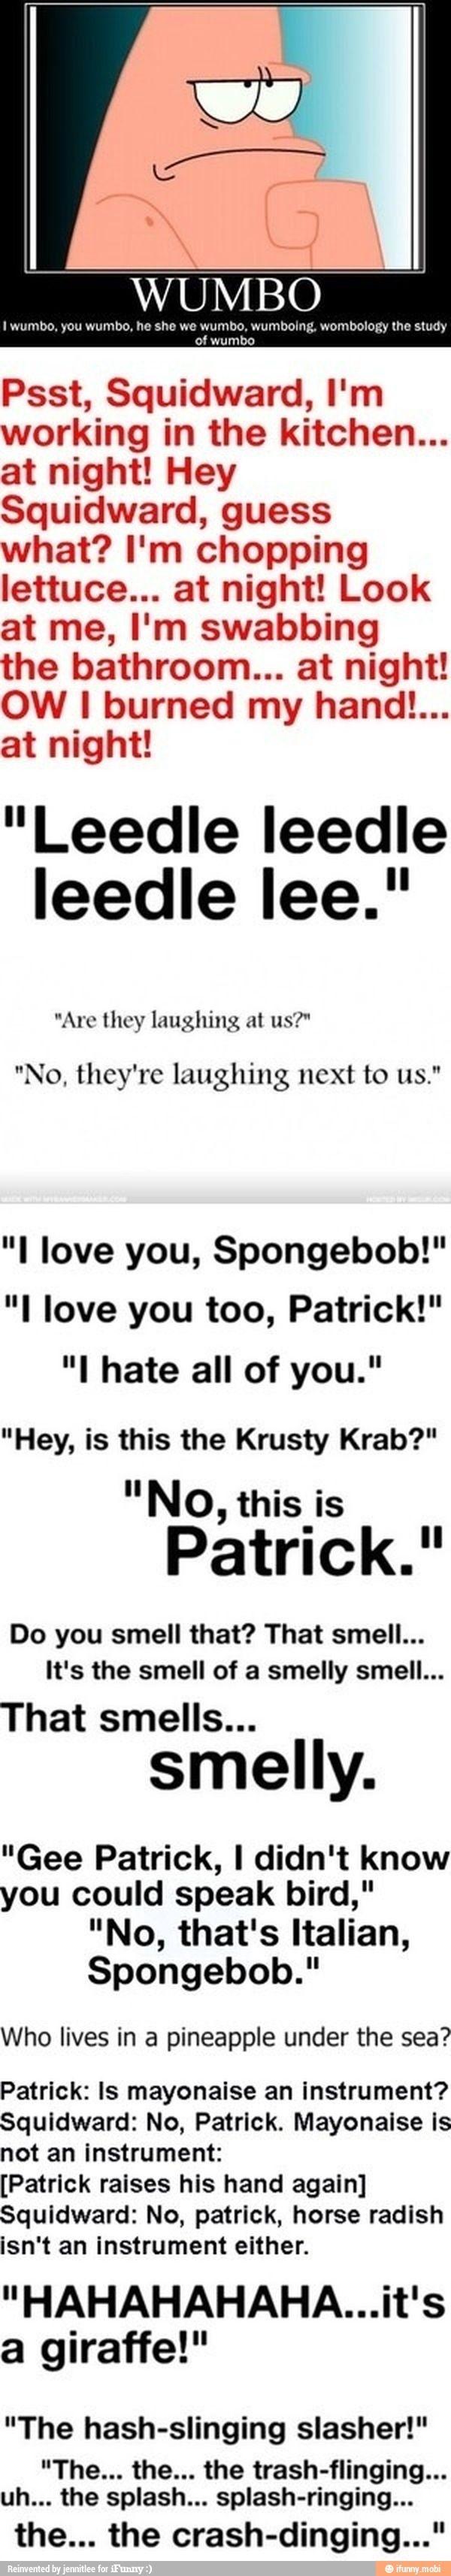 The best of SpongeBob SquarePants